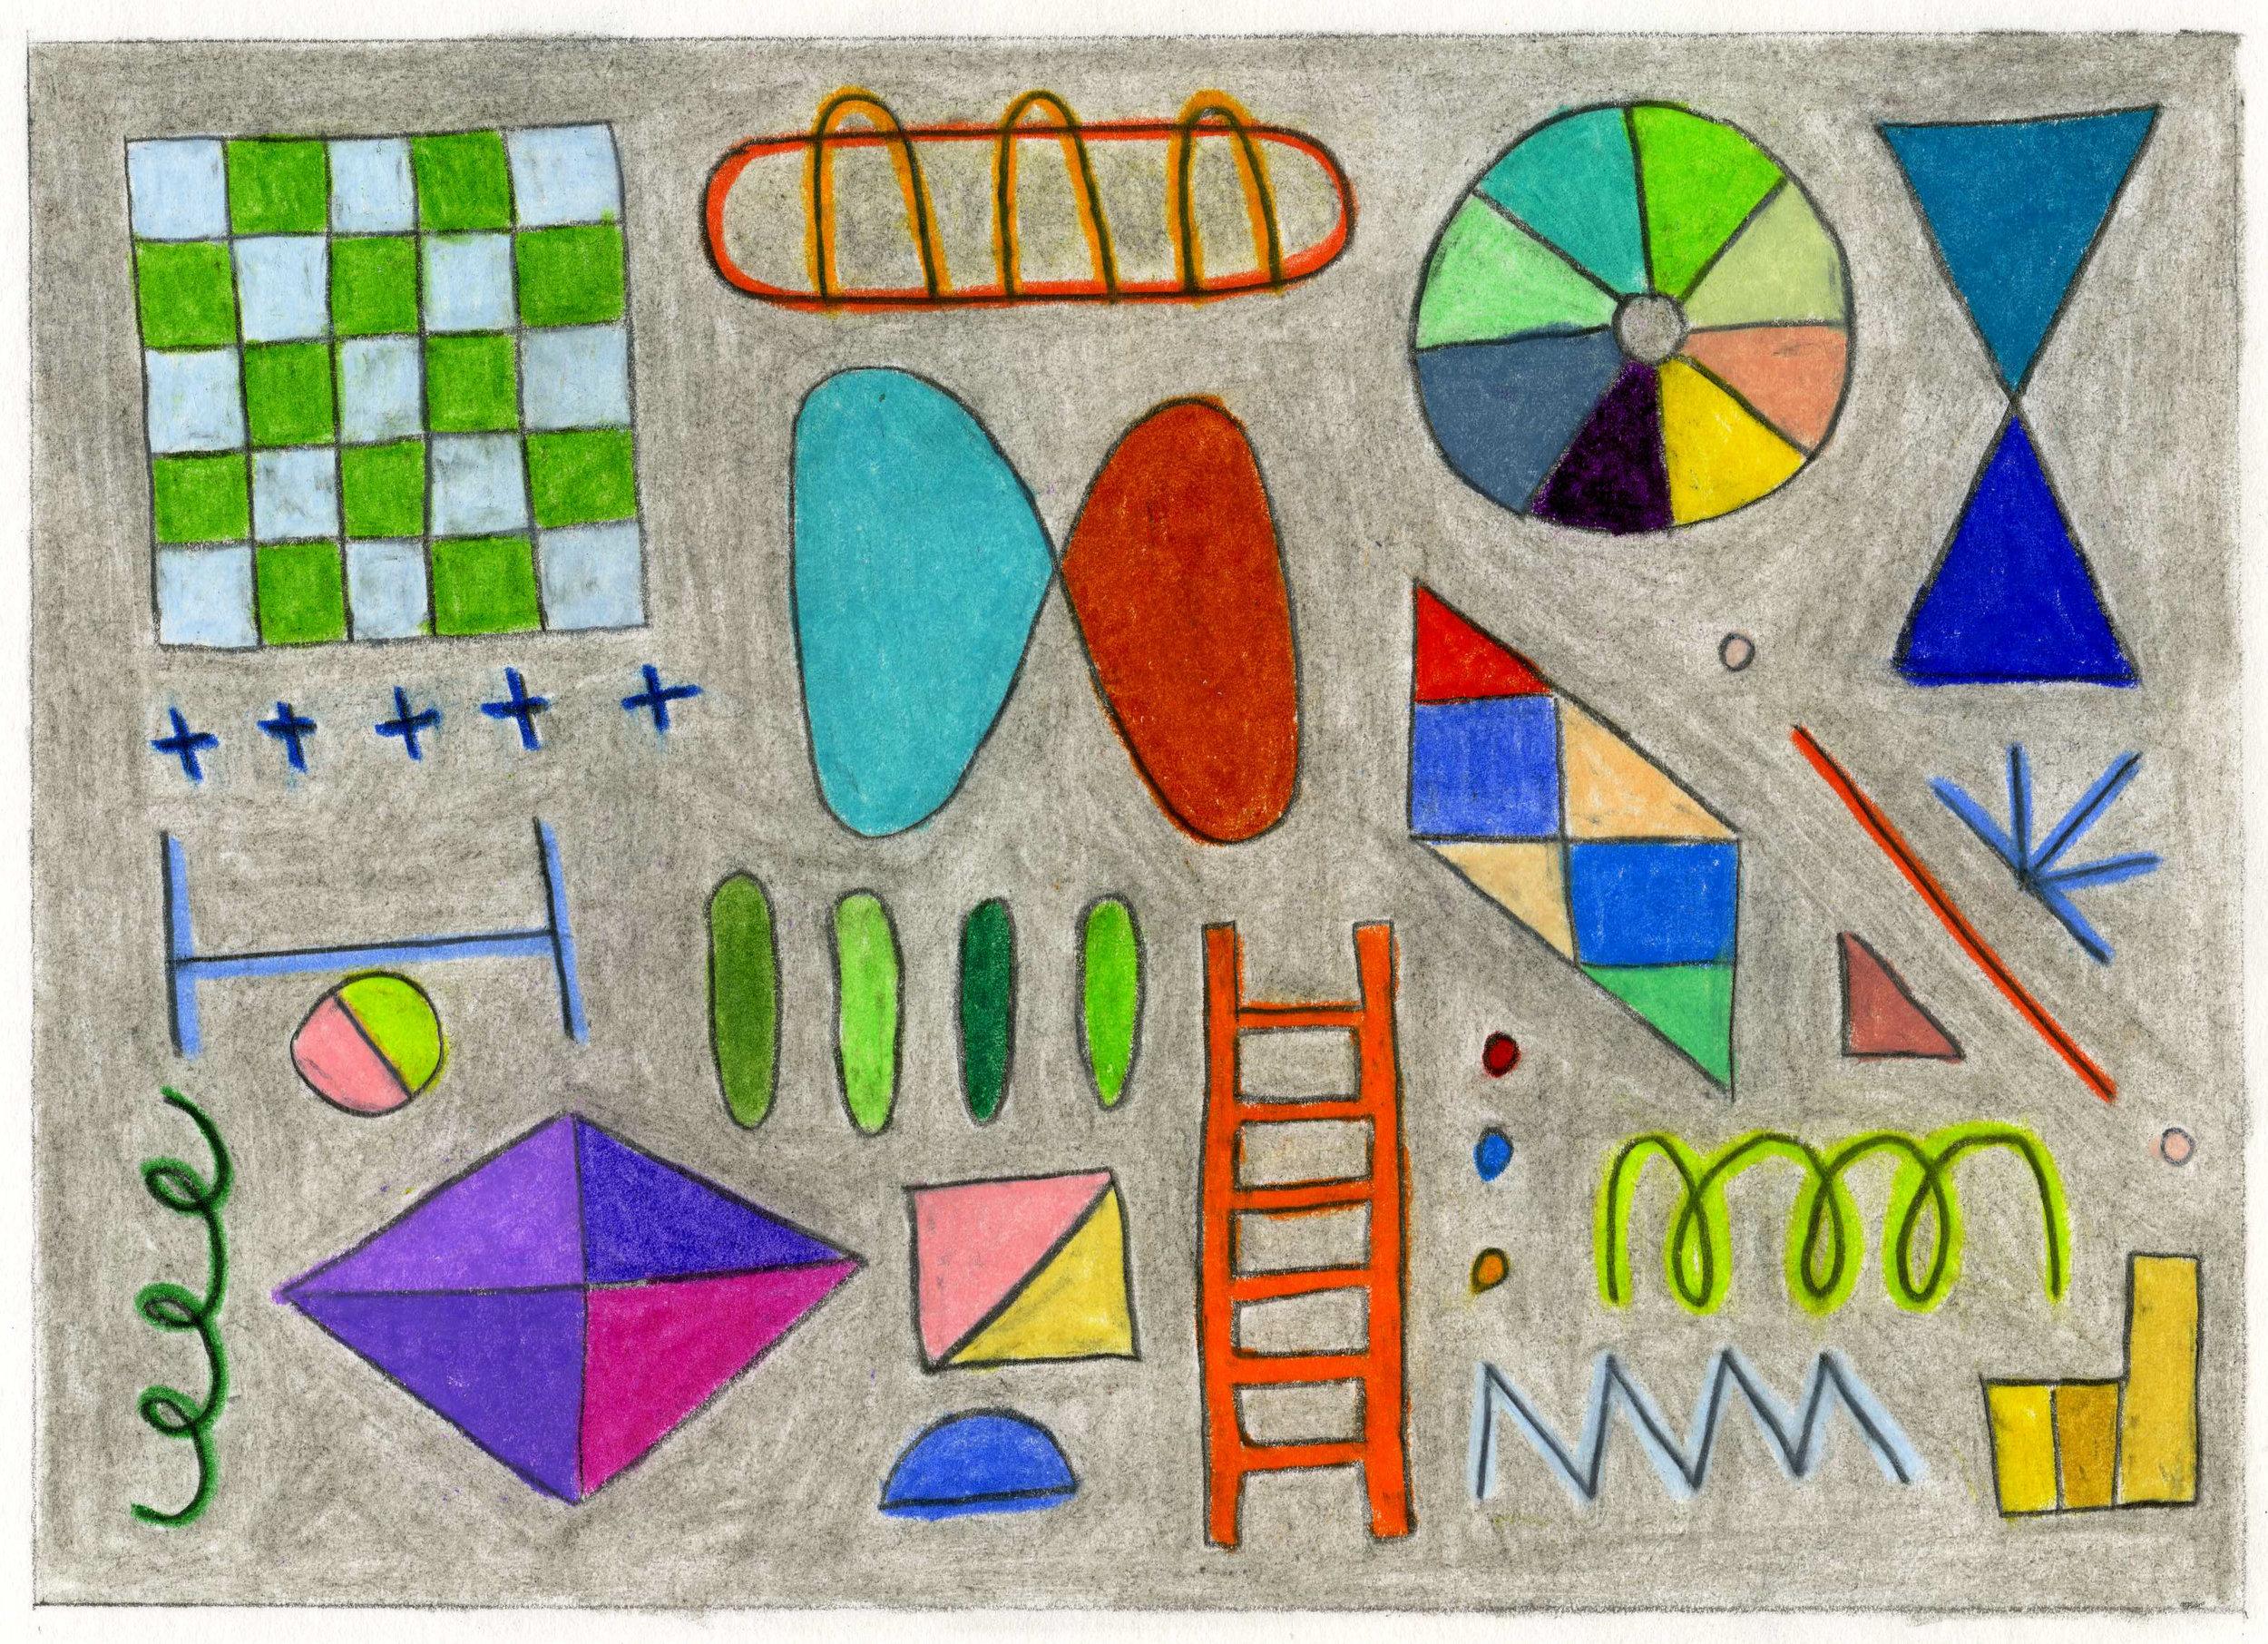 "Playground   3.875"" x 5.5""  colored pencil and graphite on bristol paper  2019"